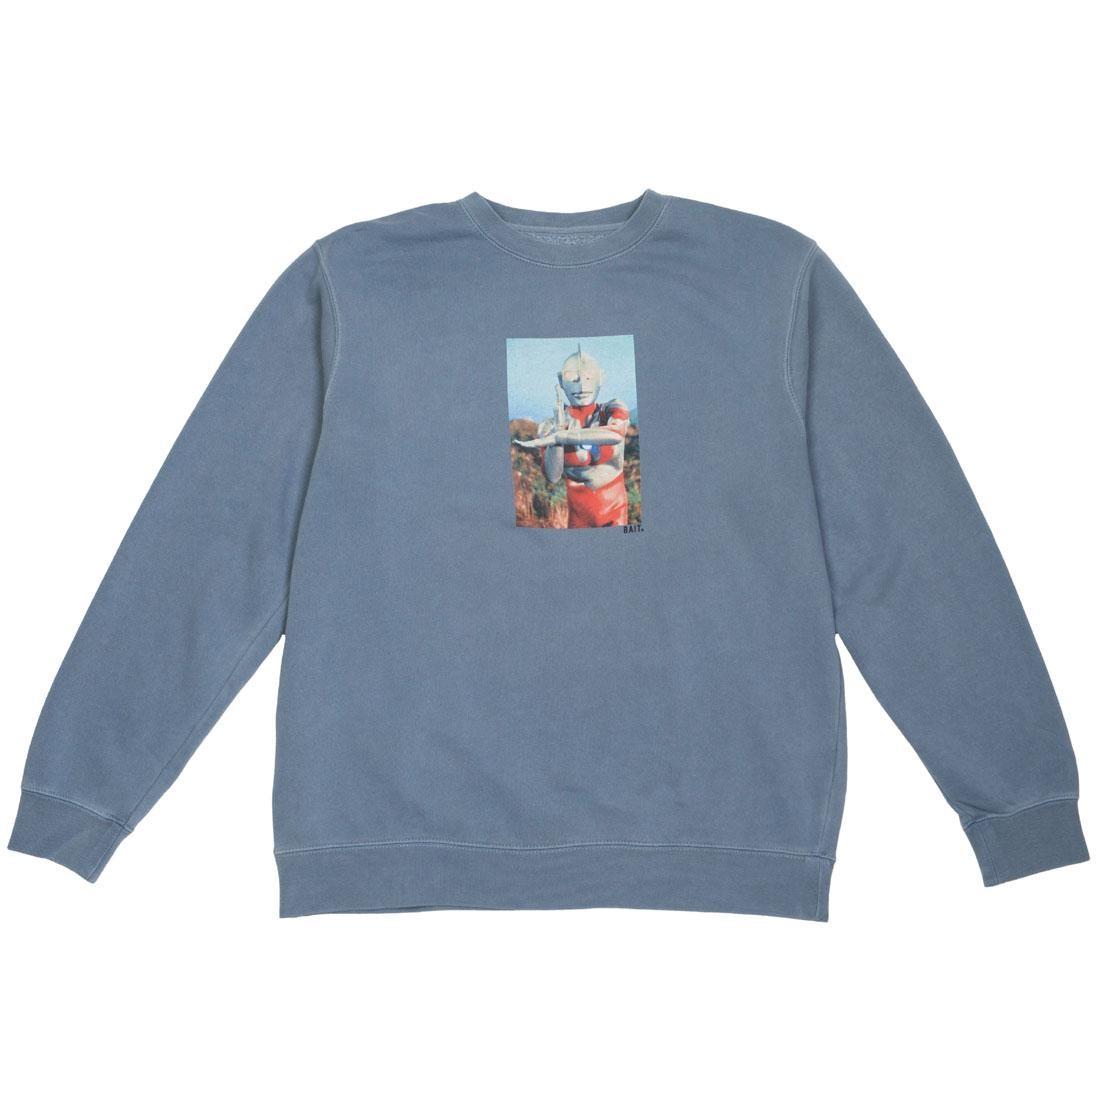 BAIT x Ultraman Men Hero Crewneck Sweater (blue / pigment)